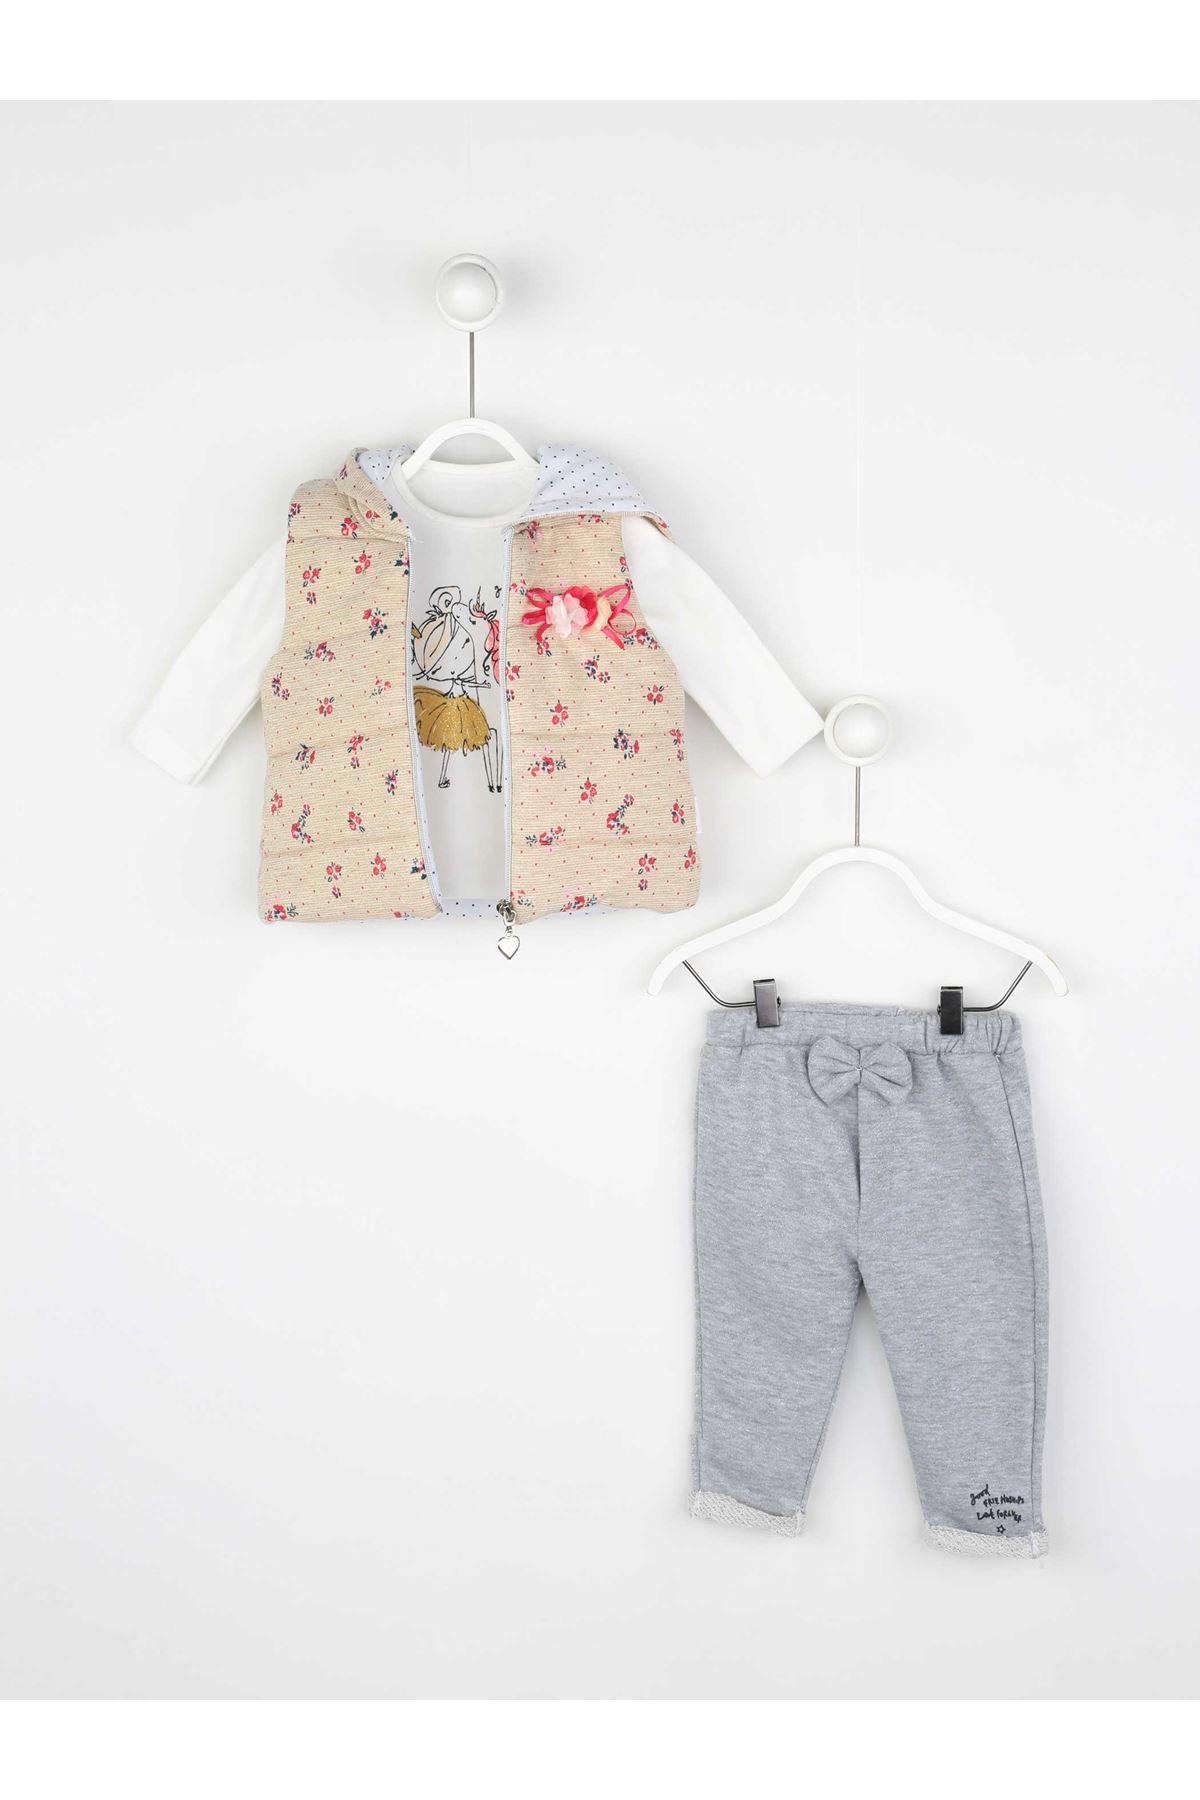 White Seasonal Girl Baby Vest Suit